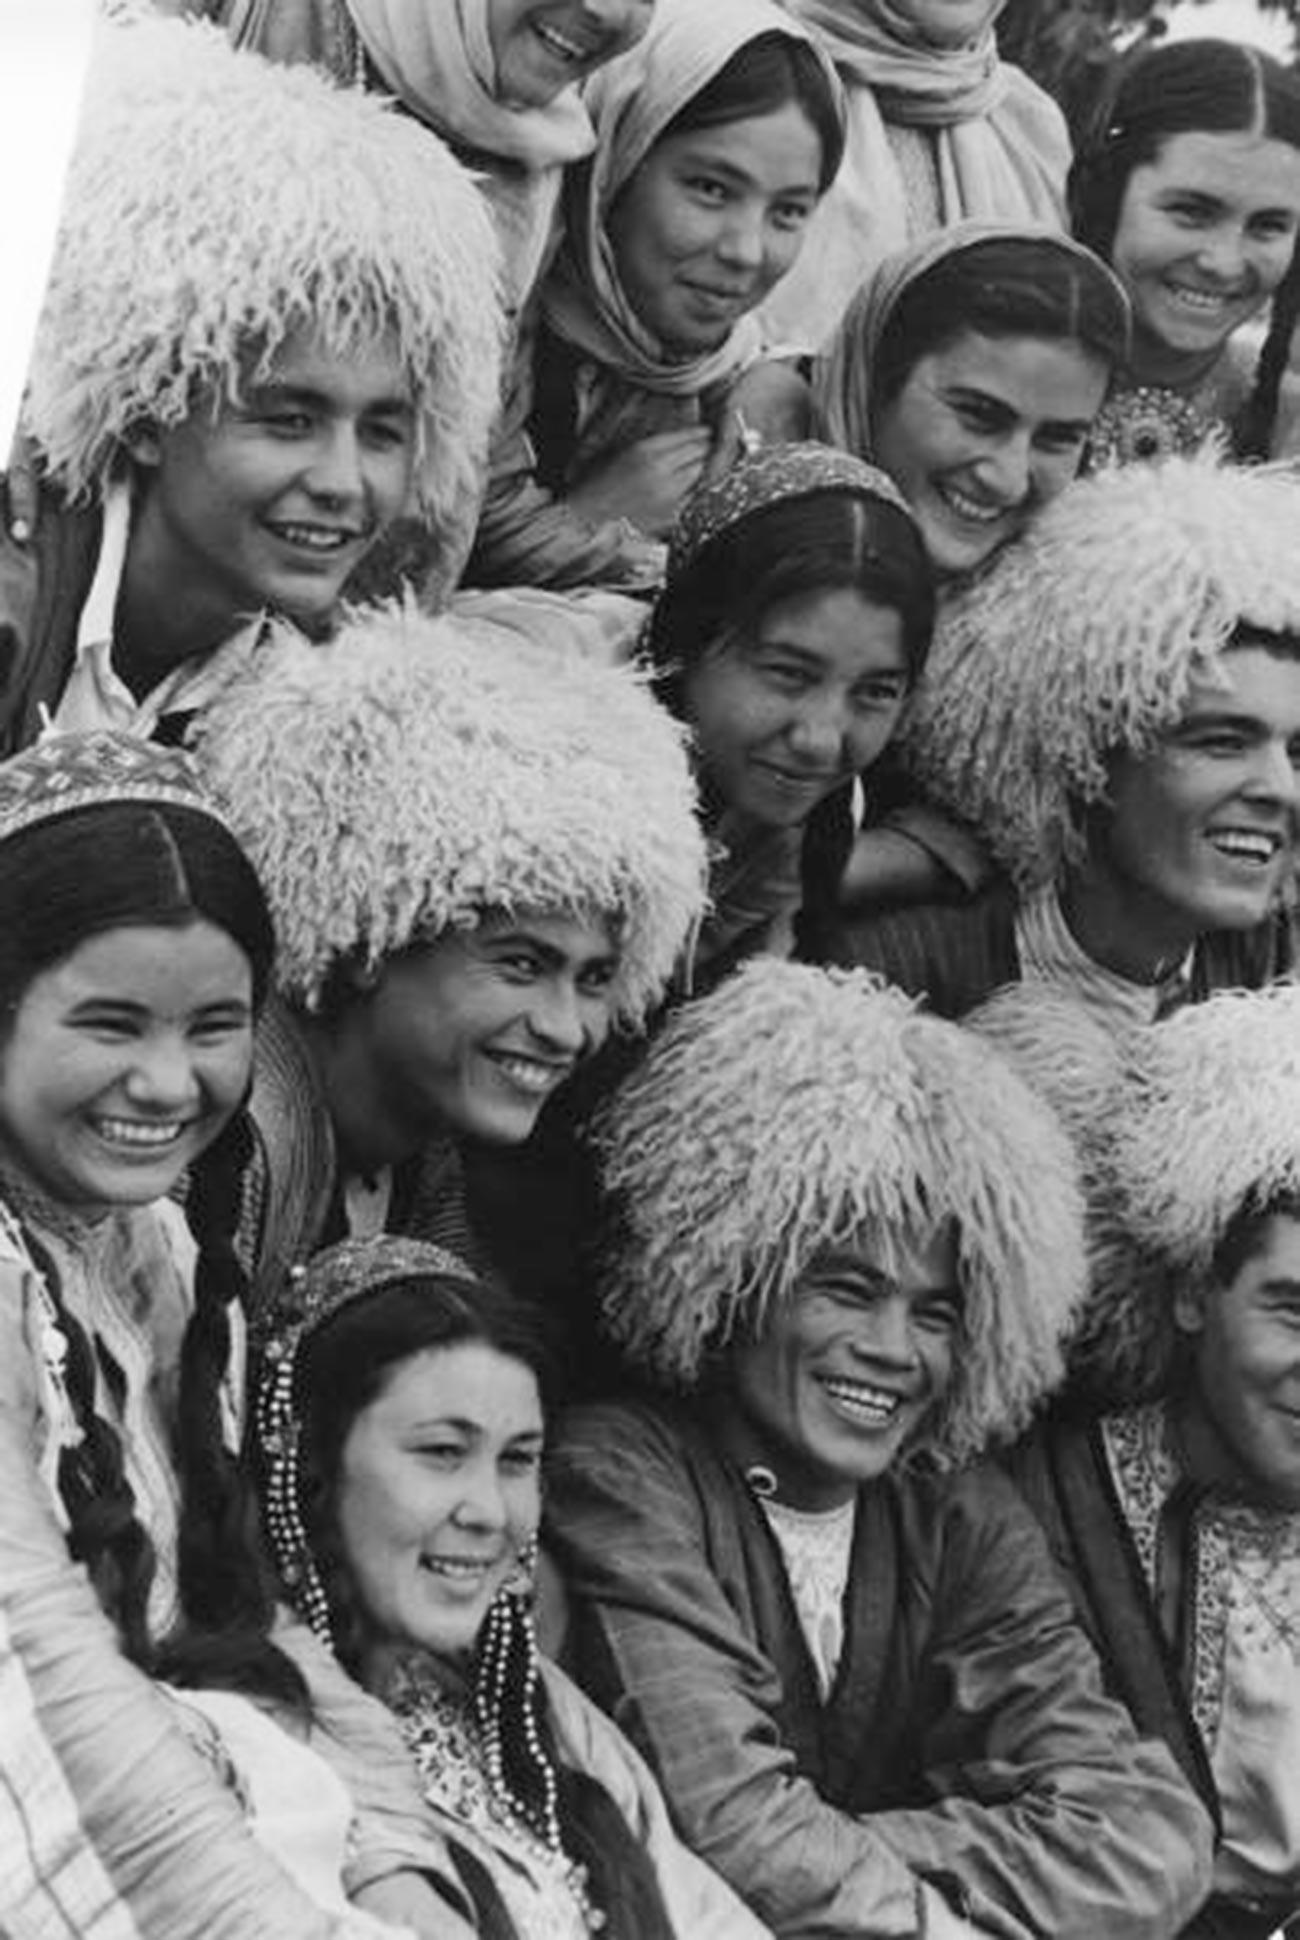 Jeunesse du Turkménistan, 1977